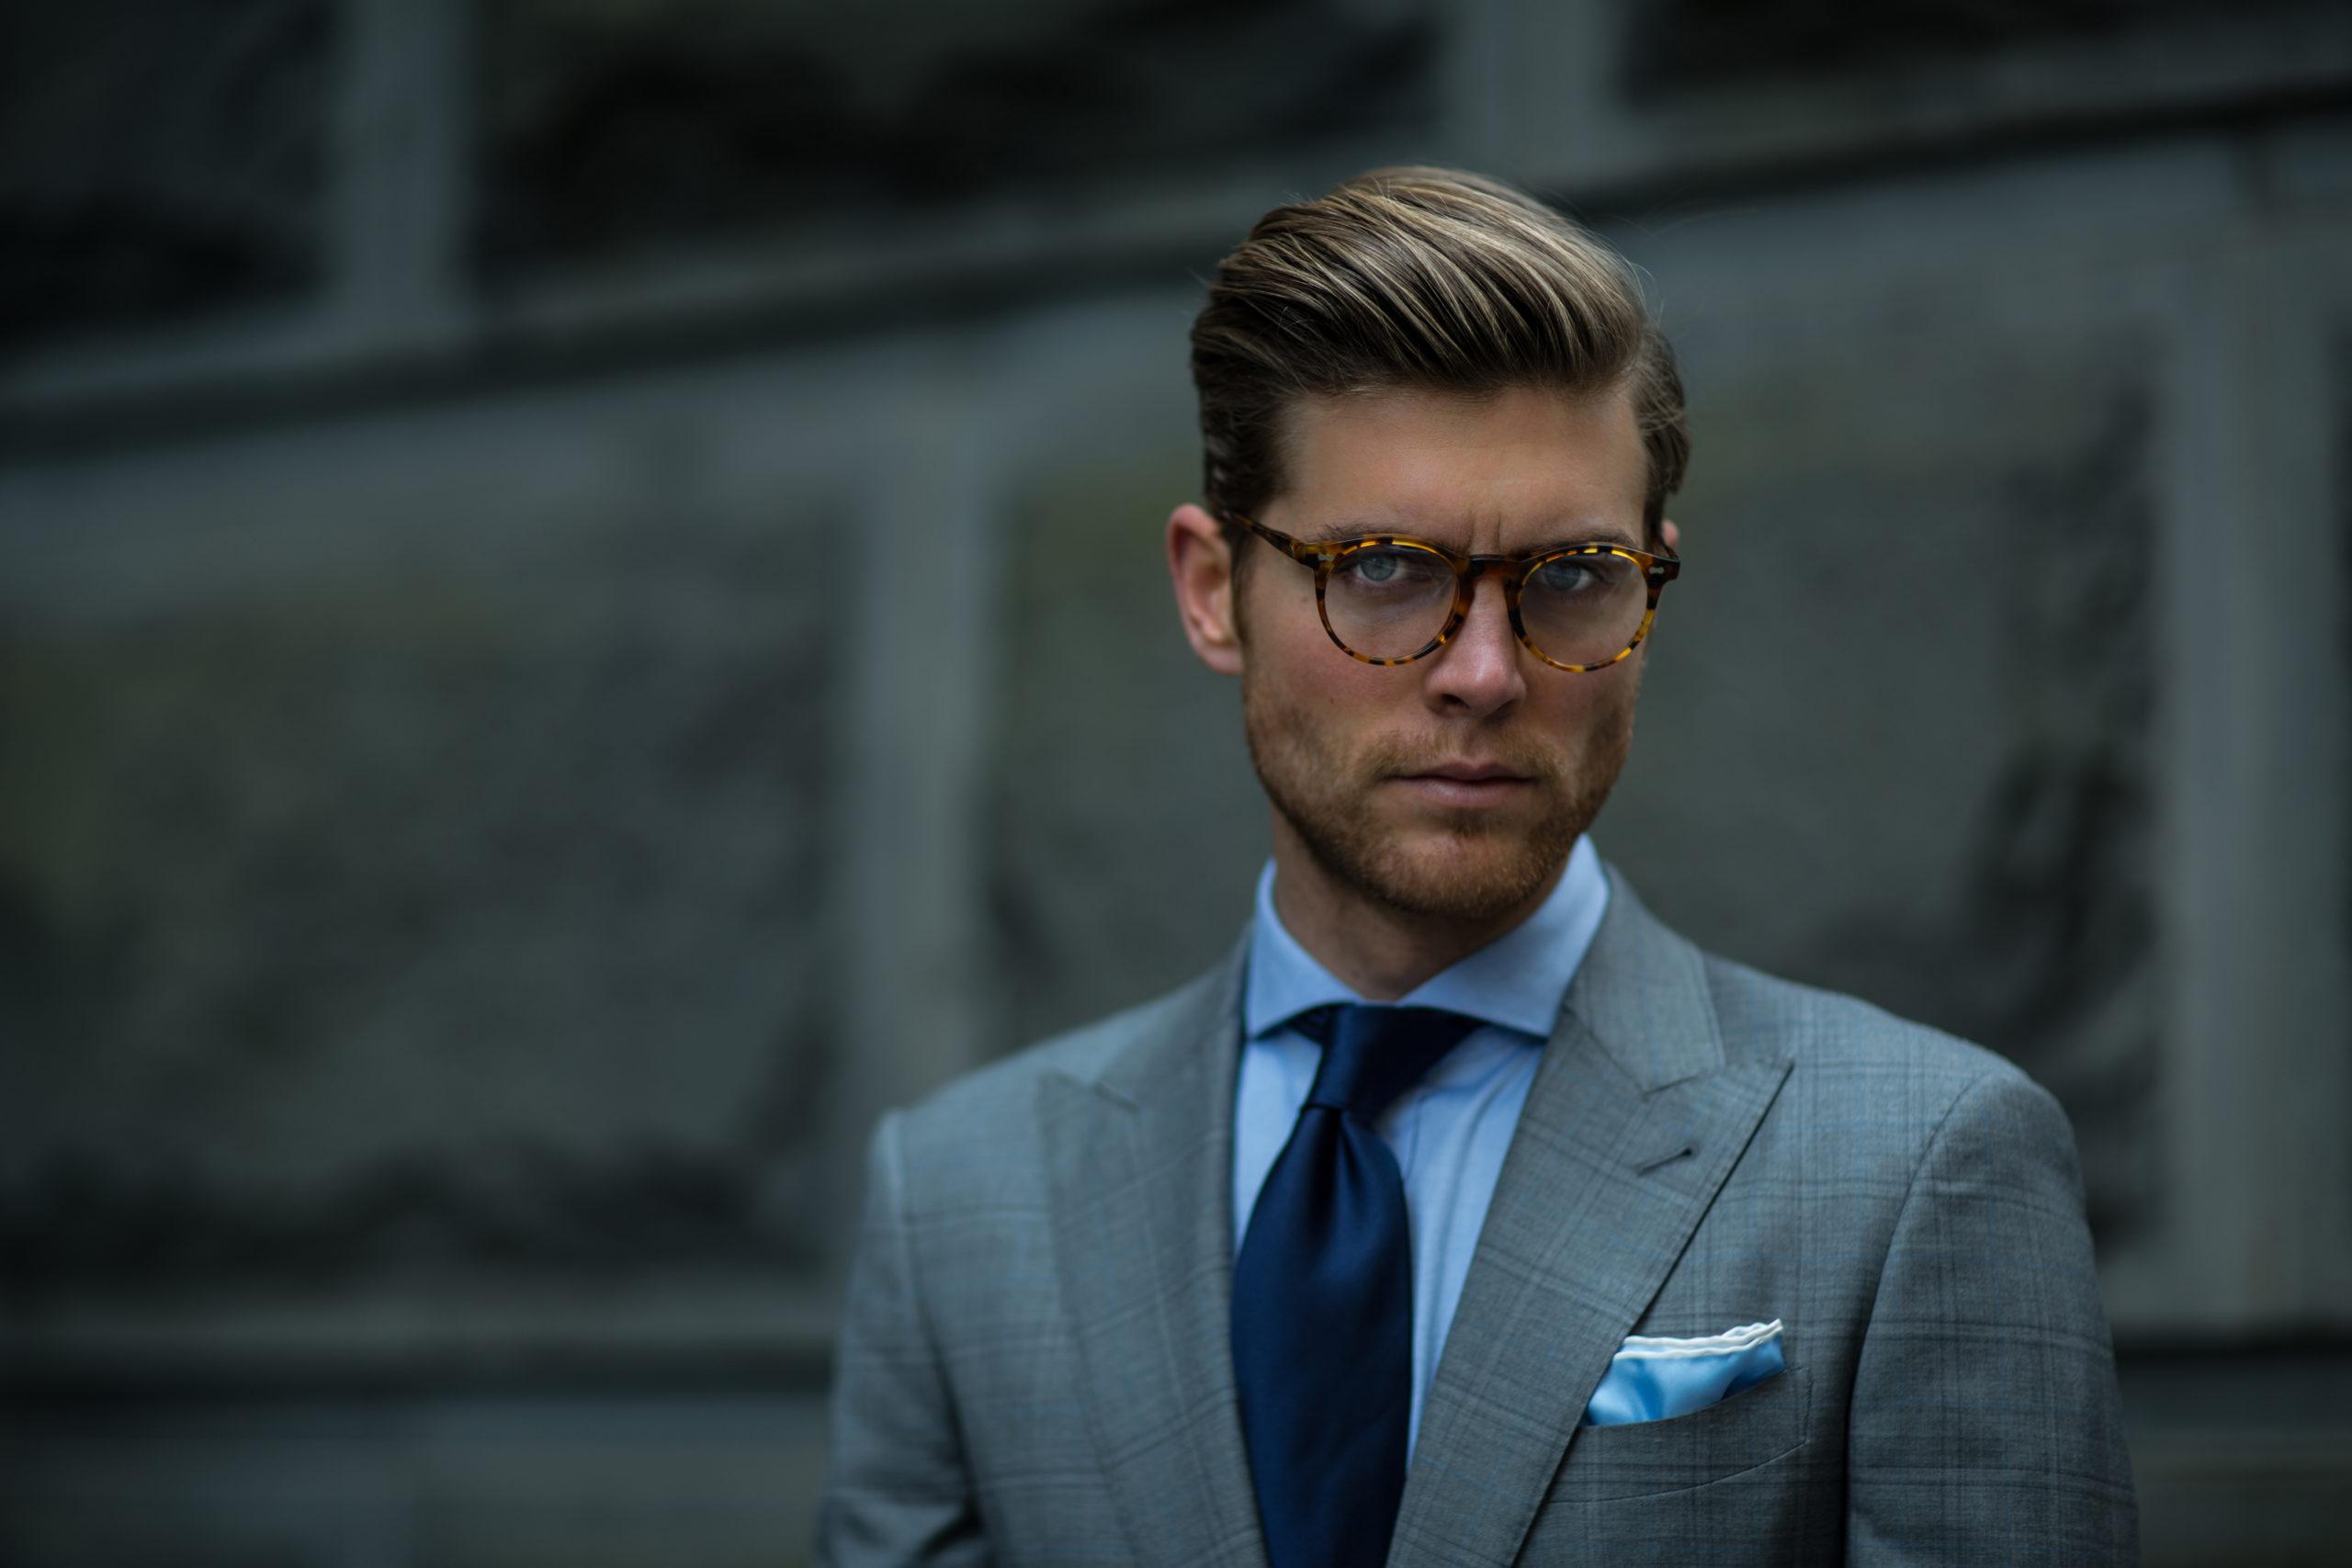 Bespoke-Tailor-Menswear-Business-Suit